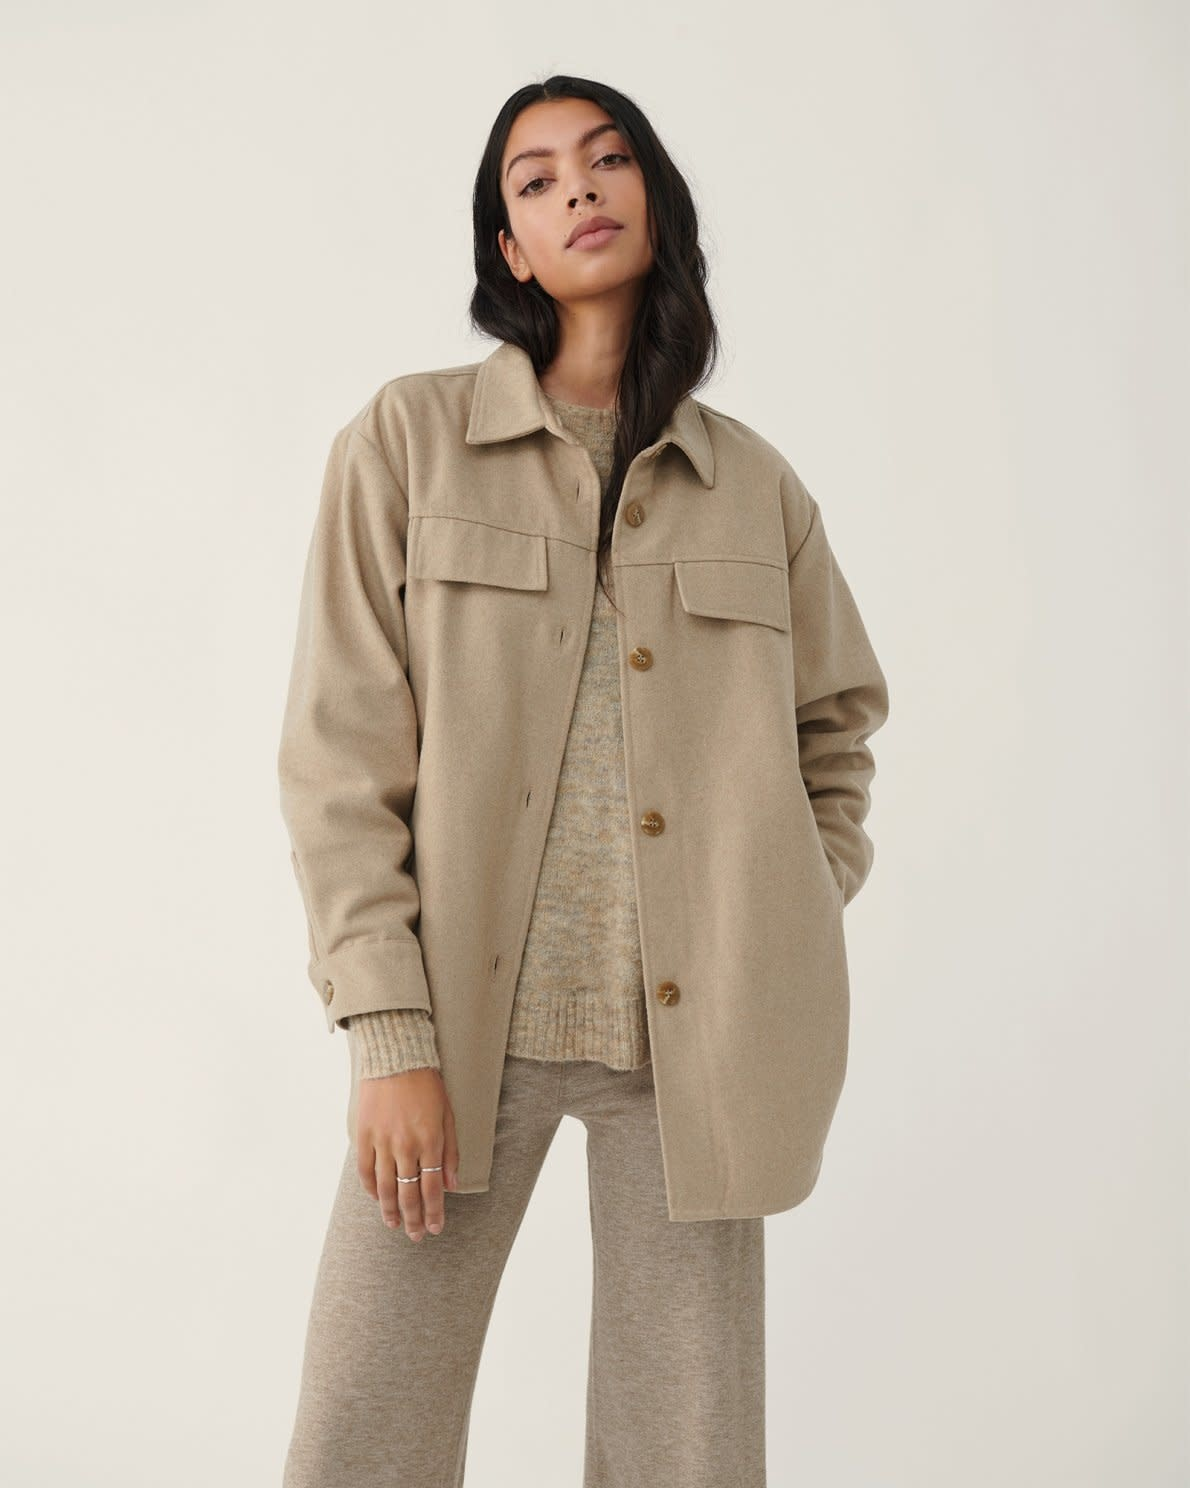 Maude White Pepper Overshirt Jacket-3